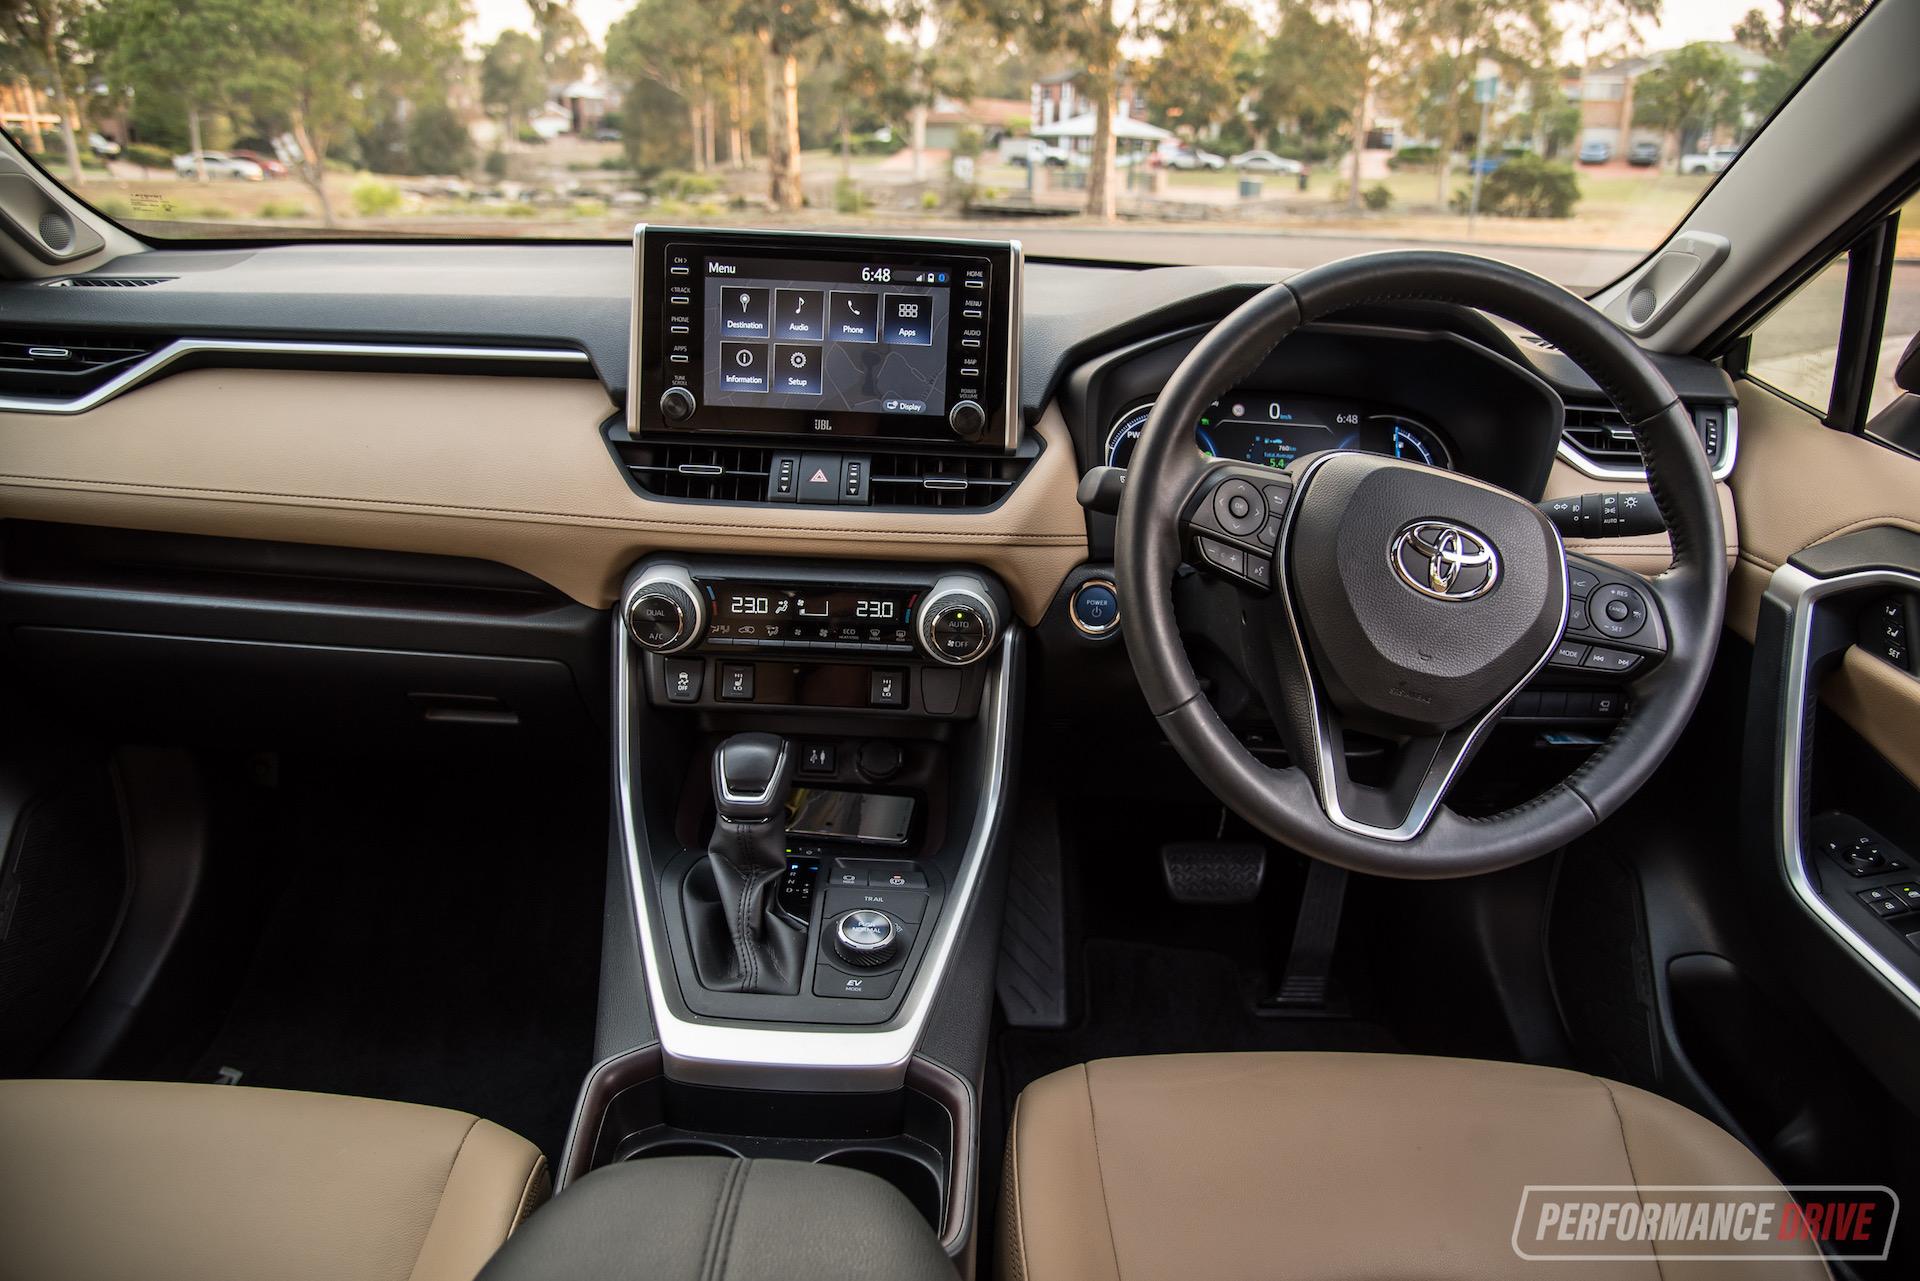 2019 Toyota Rav4 Cruiser Hybrid Awd Review Video Performancedrive